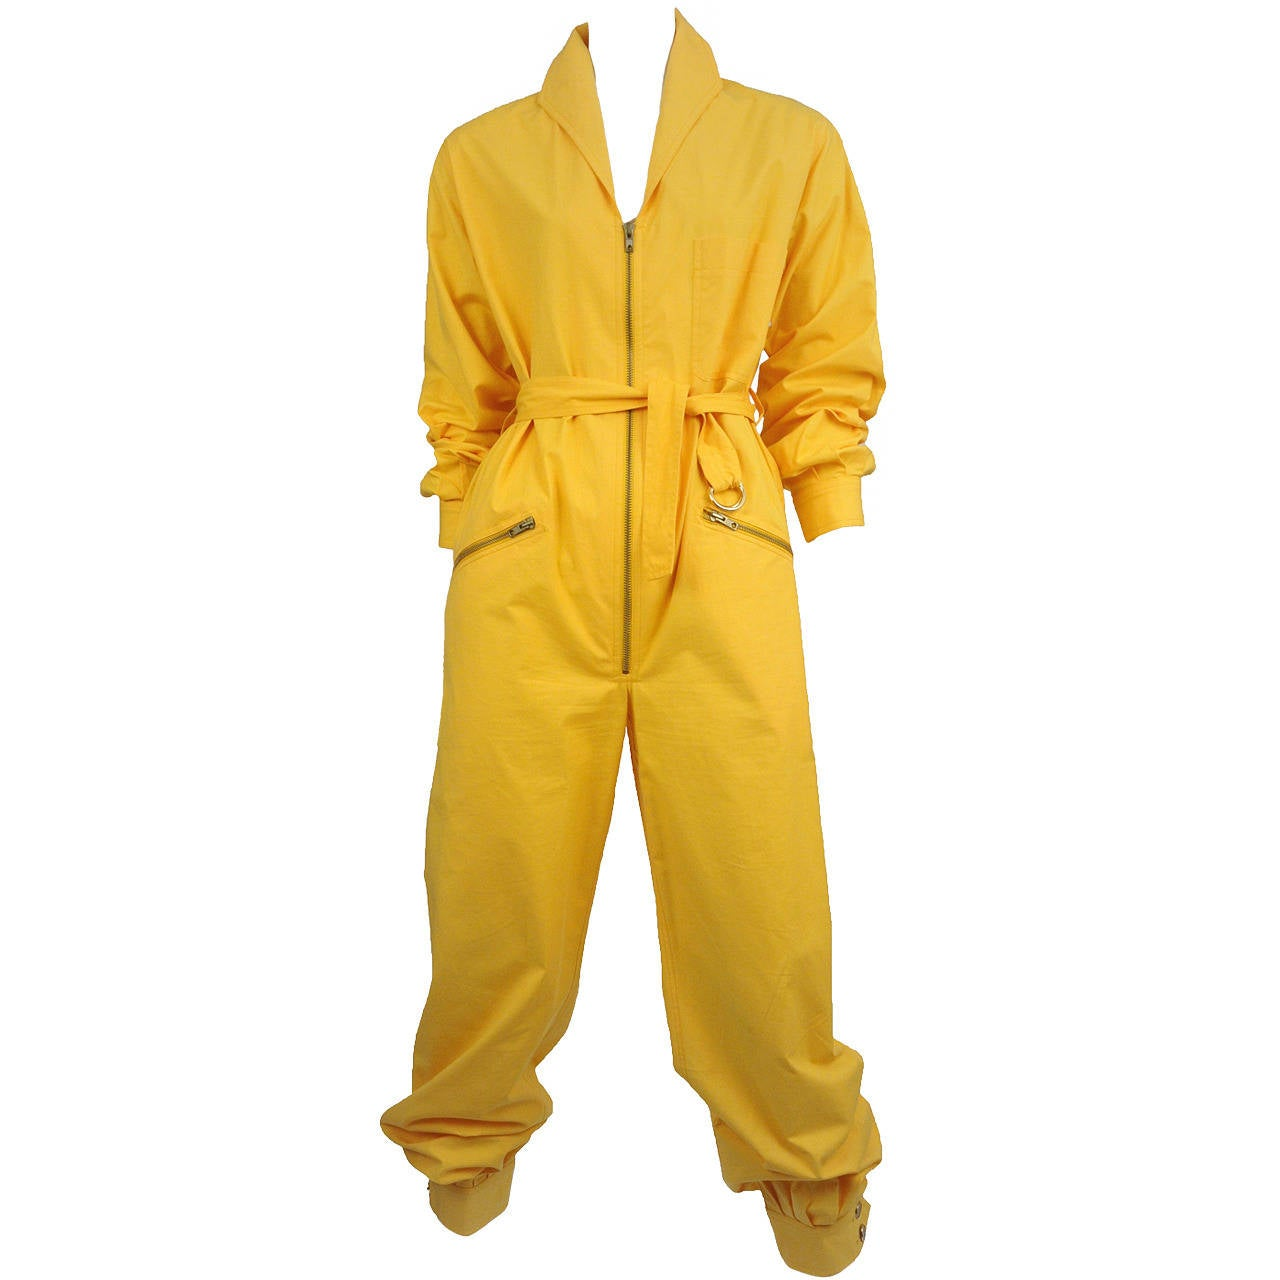 Yves Saint Laurent Yellow Cotton Mechanics Romper 1